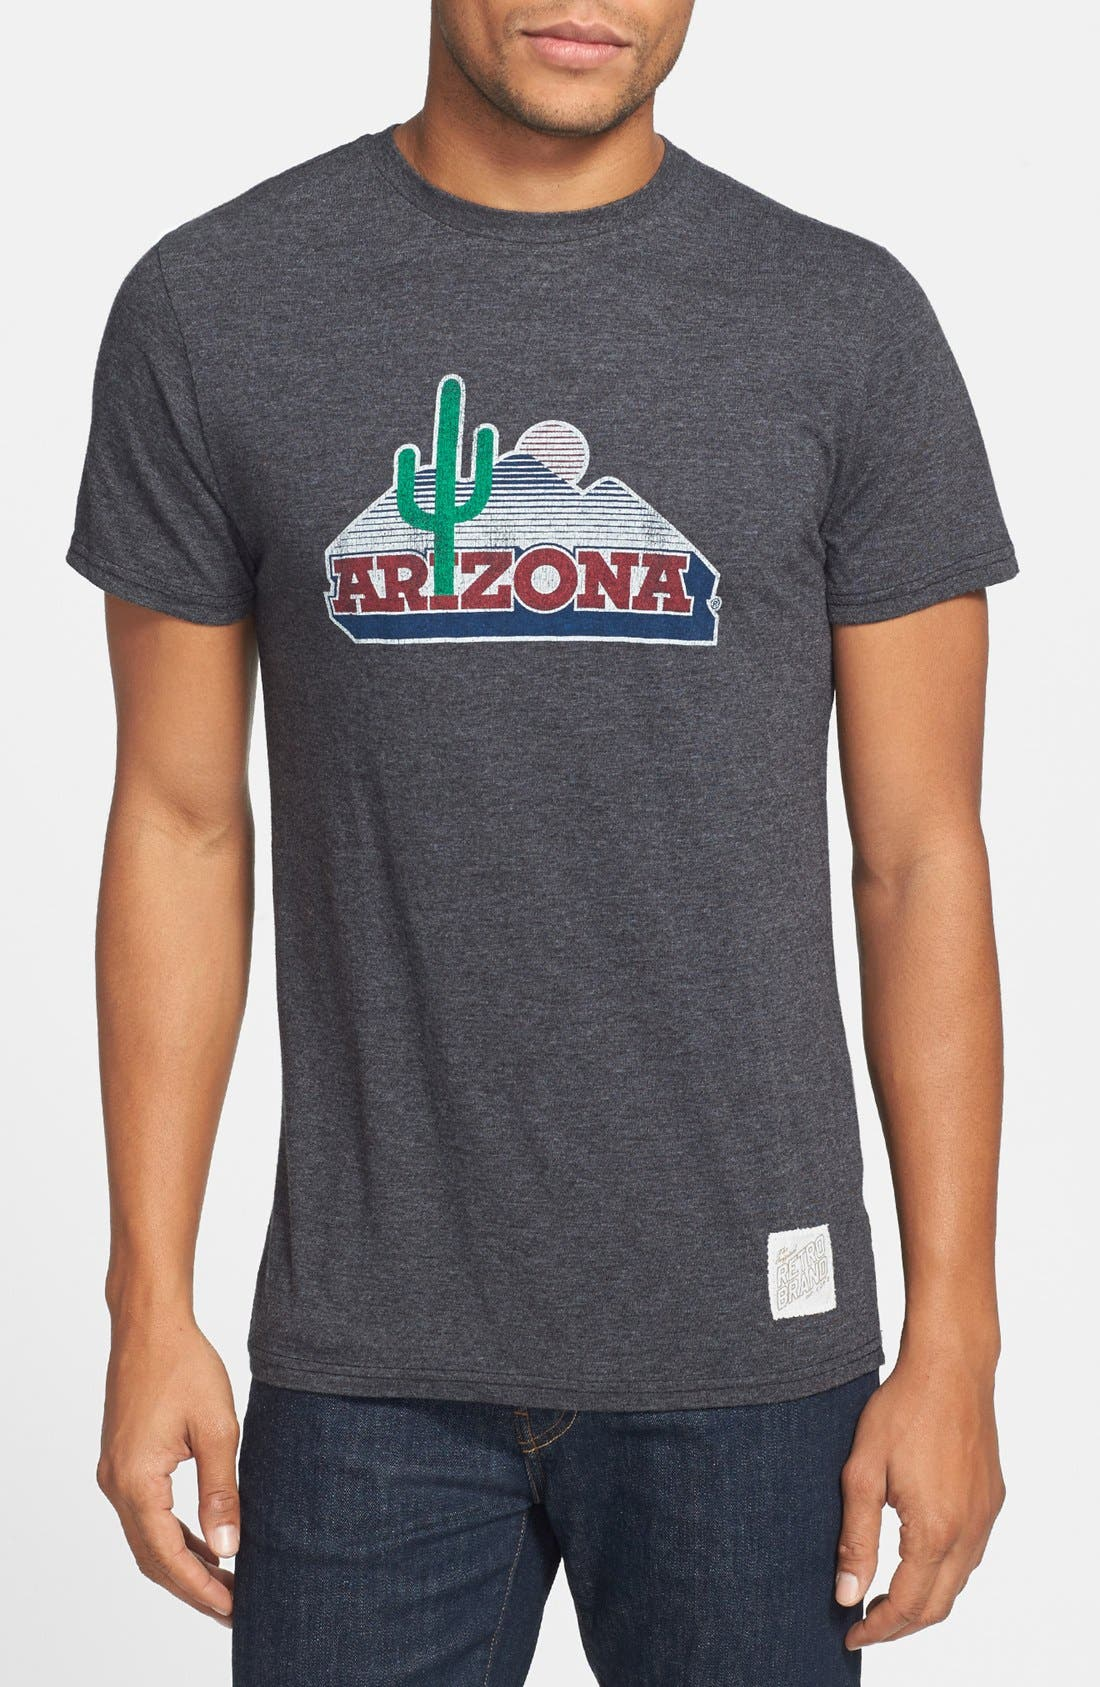 Alternate Image 1 Selected - Retro Brand 'Arizona Wildcats' Team T-Shirt